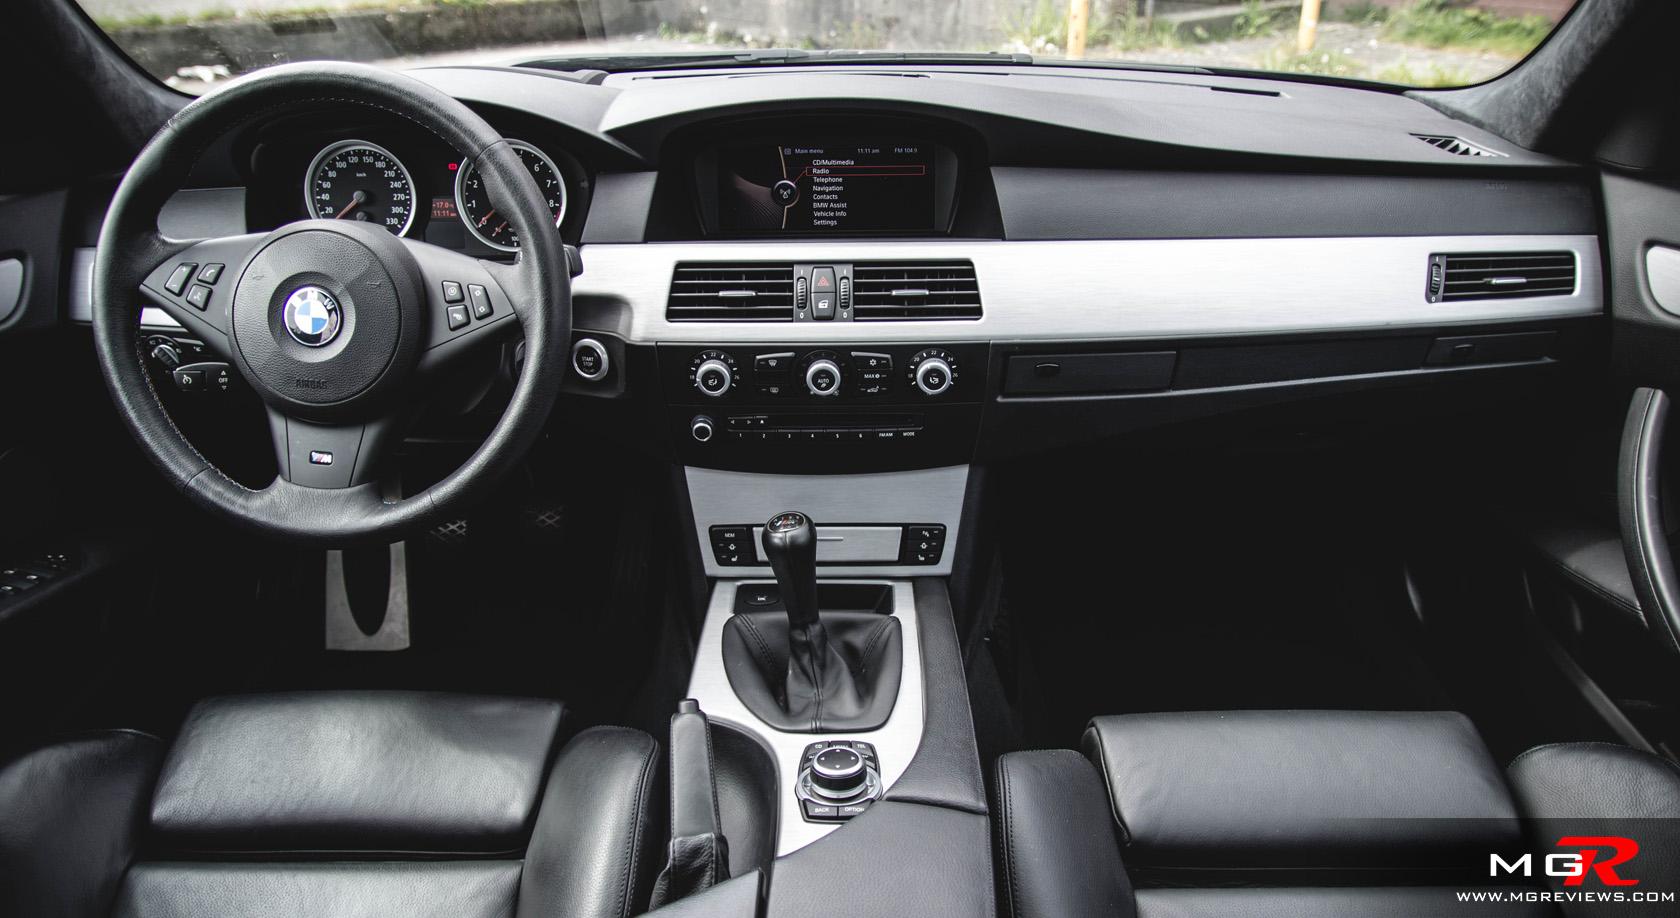 review 2010 bmw m5 m g reviews rh mgreviews com bmw m5 manual for sale bmw m5 manual transmission